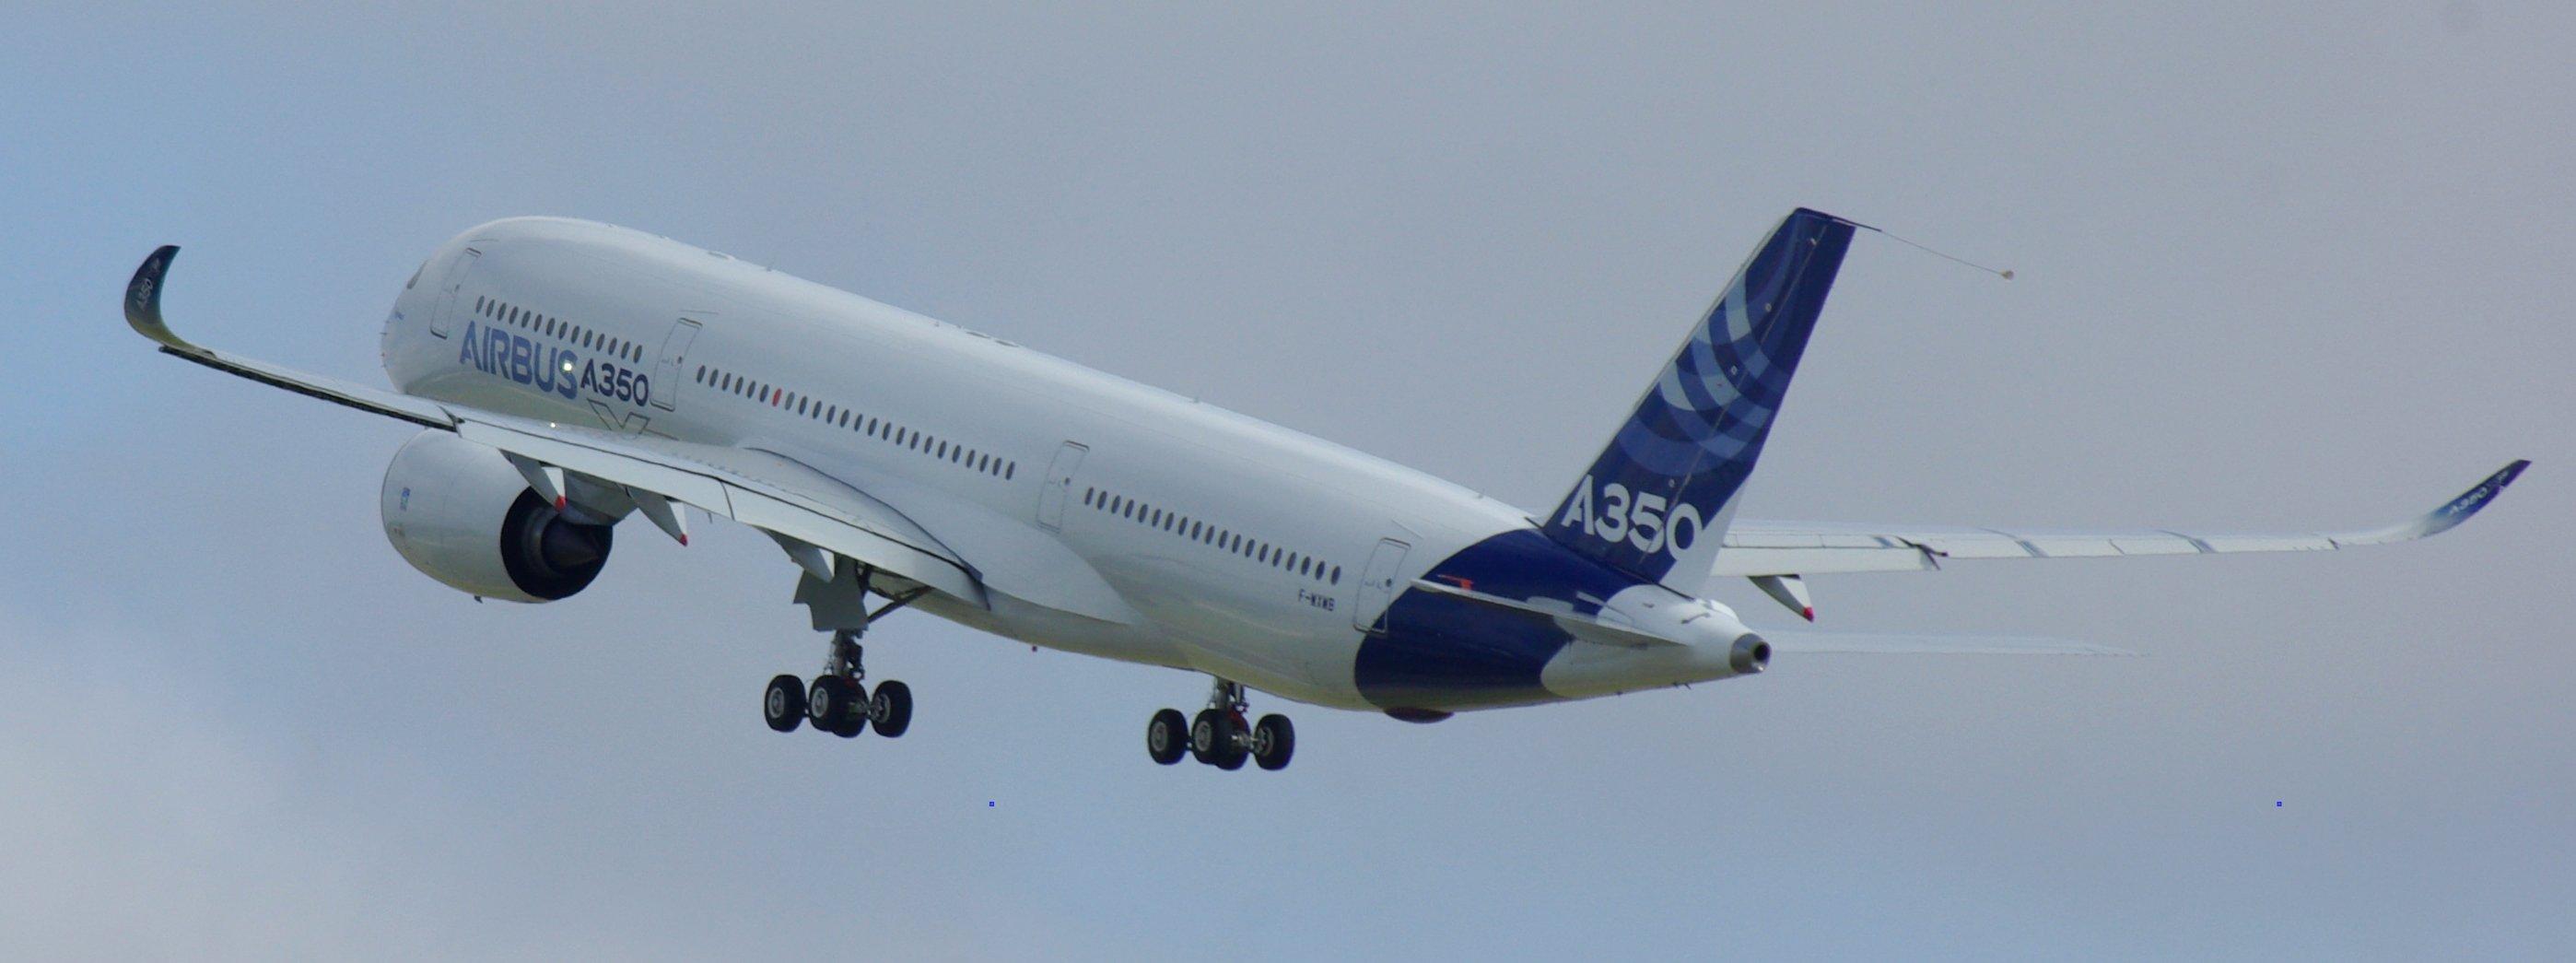 File:Airbus A350-900 Maiden Flight (Take-off) 1.JPG ...